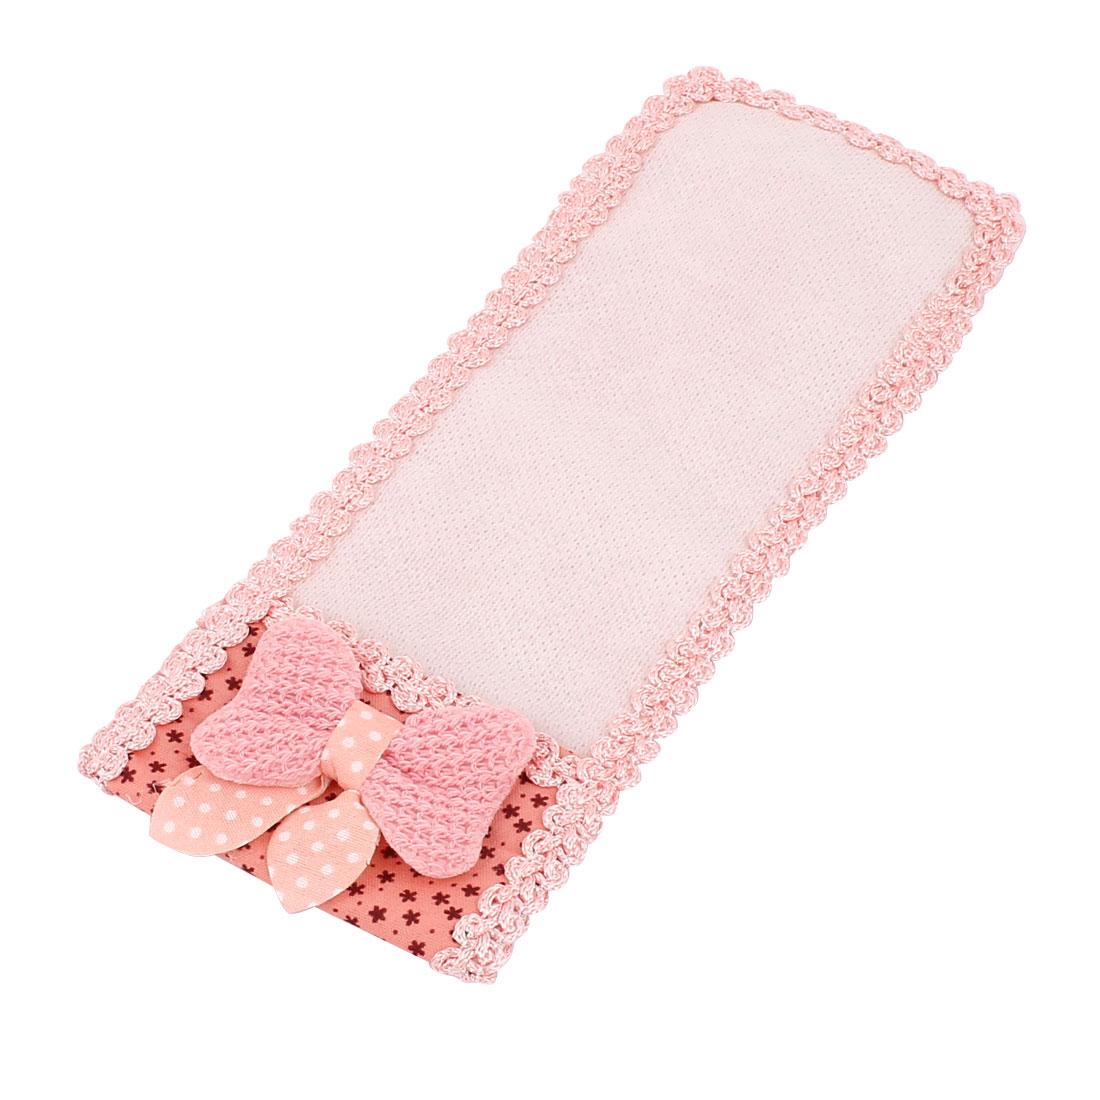 Dustproof Lace Trim Bowknot Detailing Remote Control Case Cover TV Protector 17cm x 7.2cm Pink